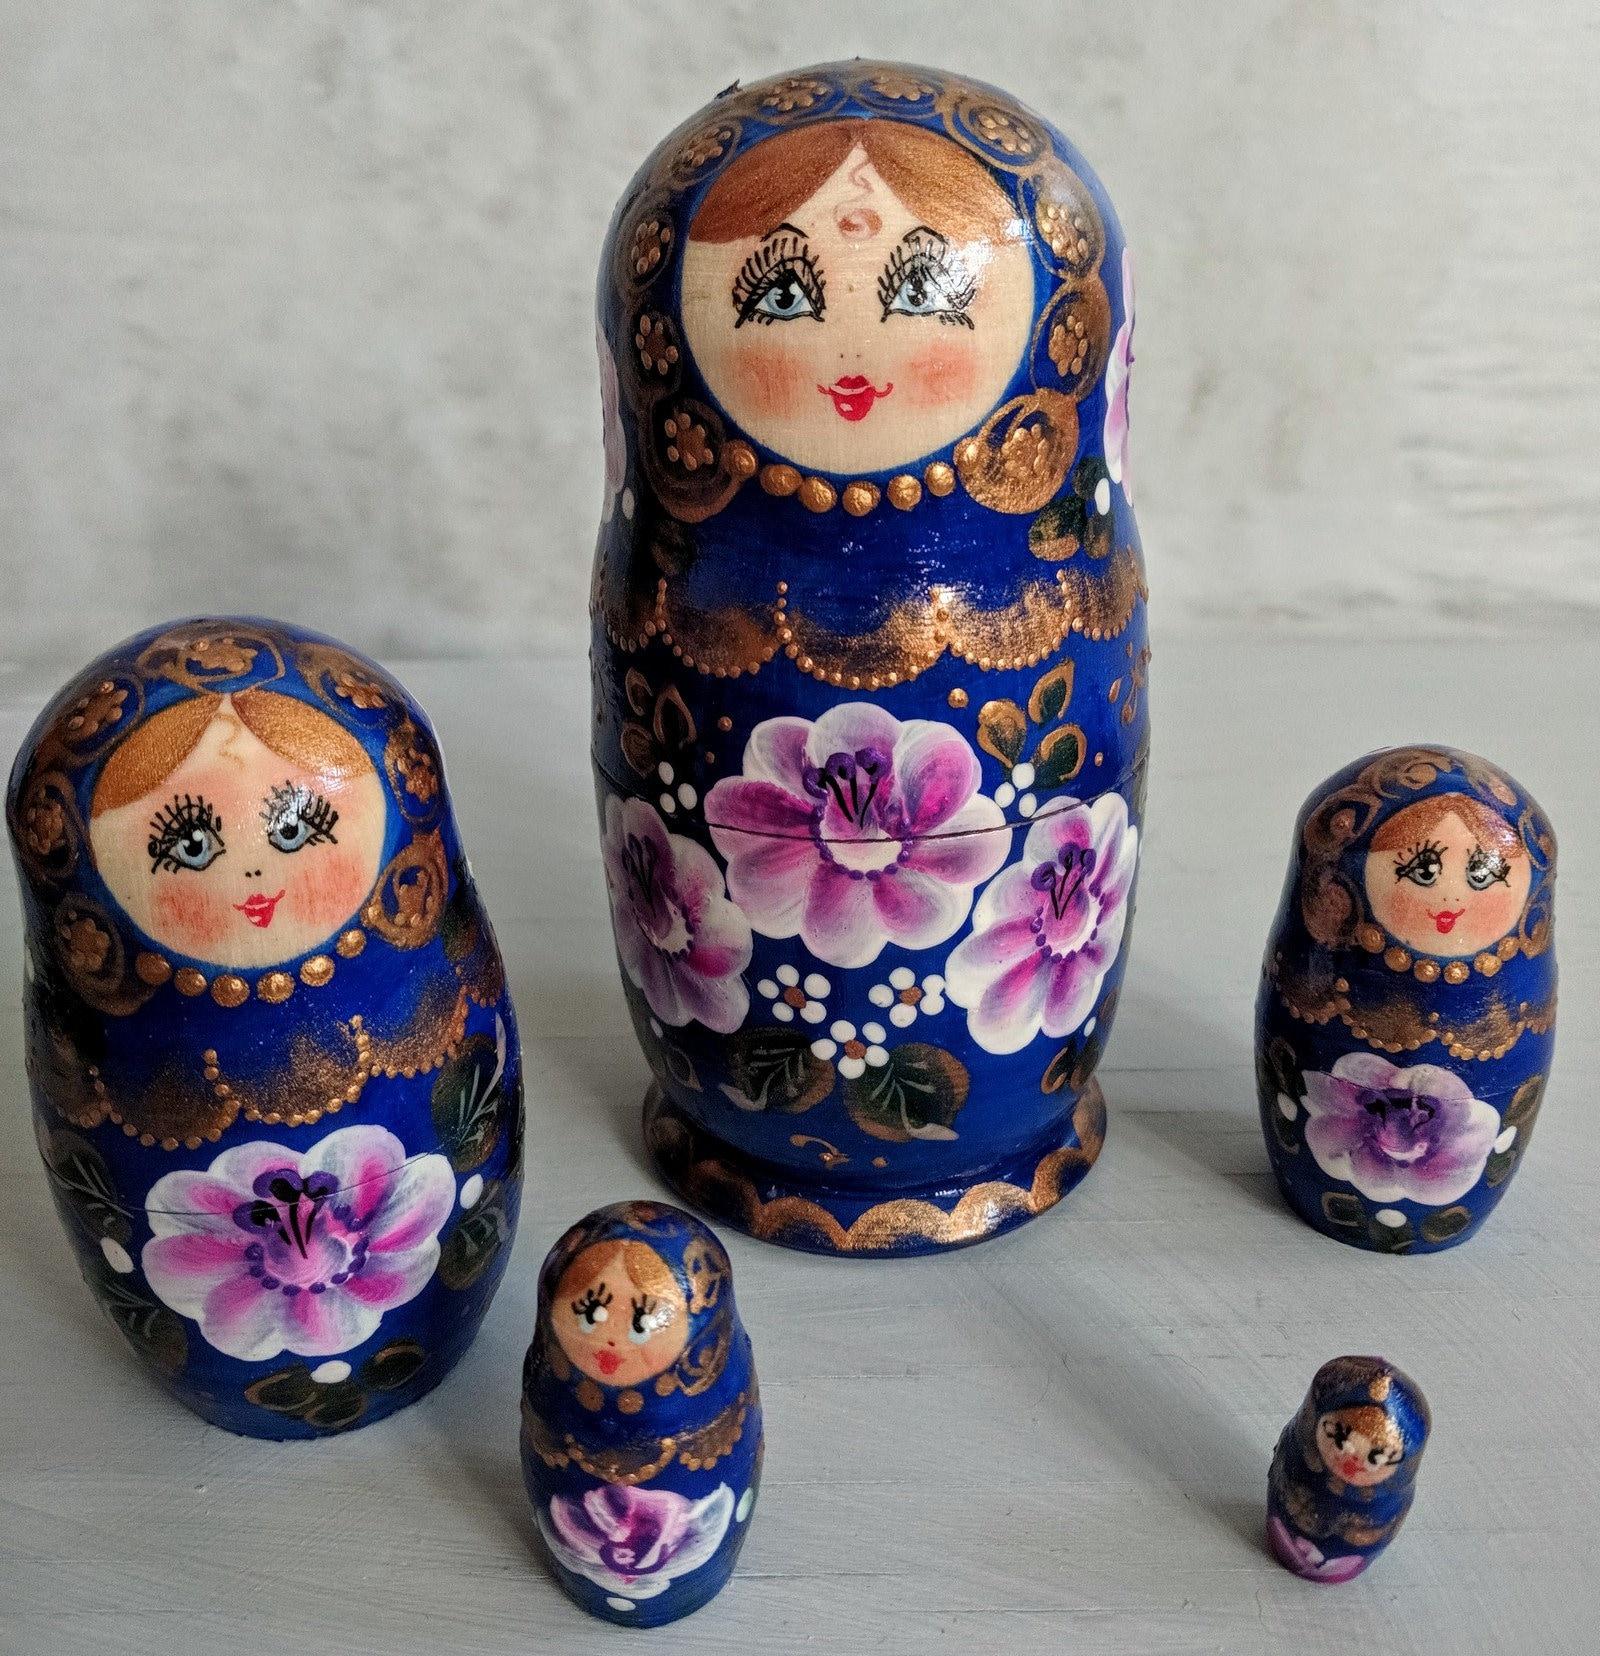 10 Wooden Russian Nesting Babushka Matryoshka Girl Dolls Set Hand Painted